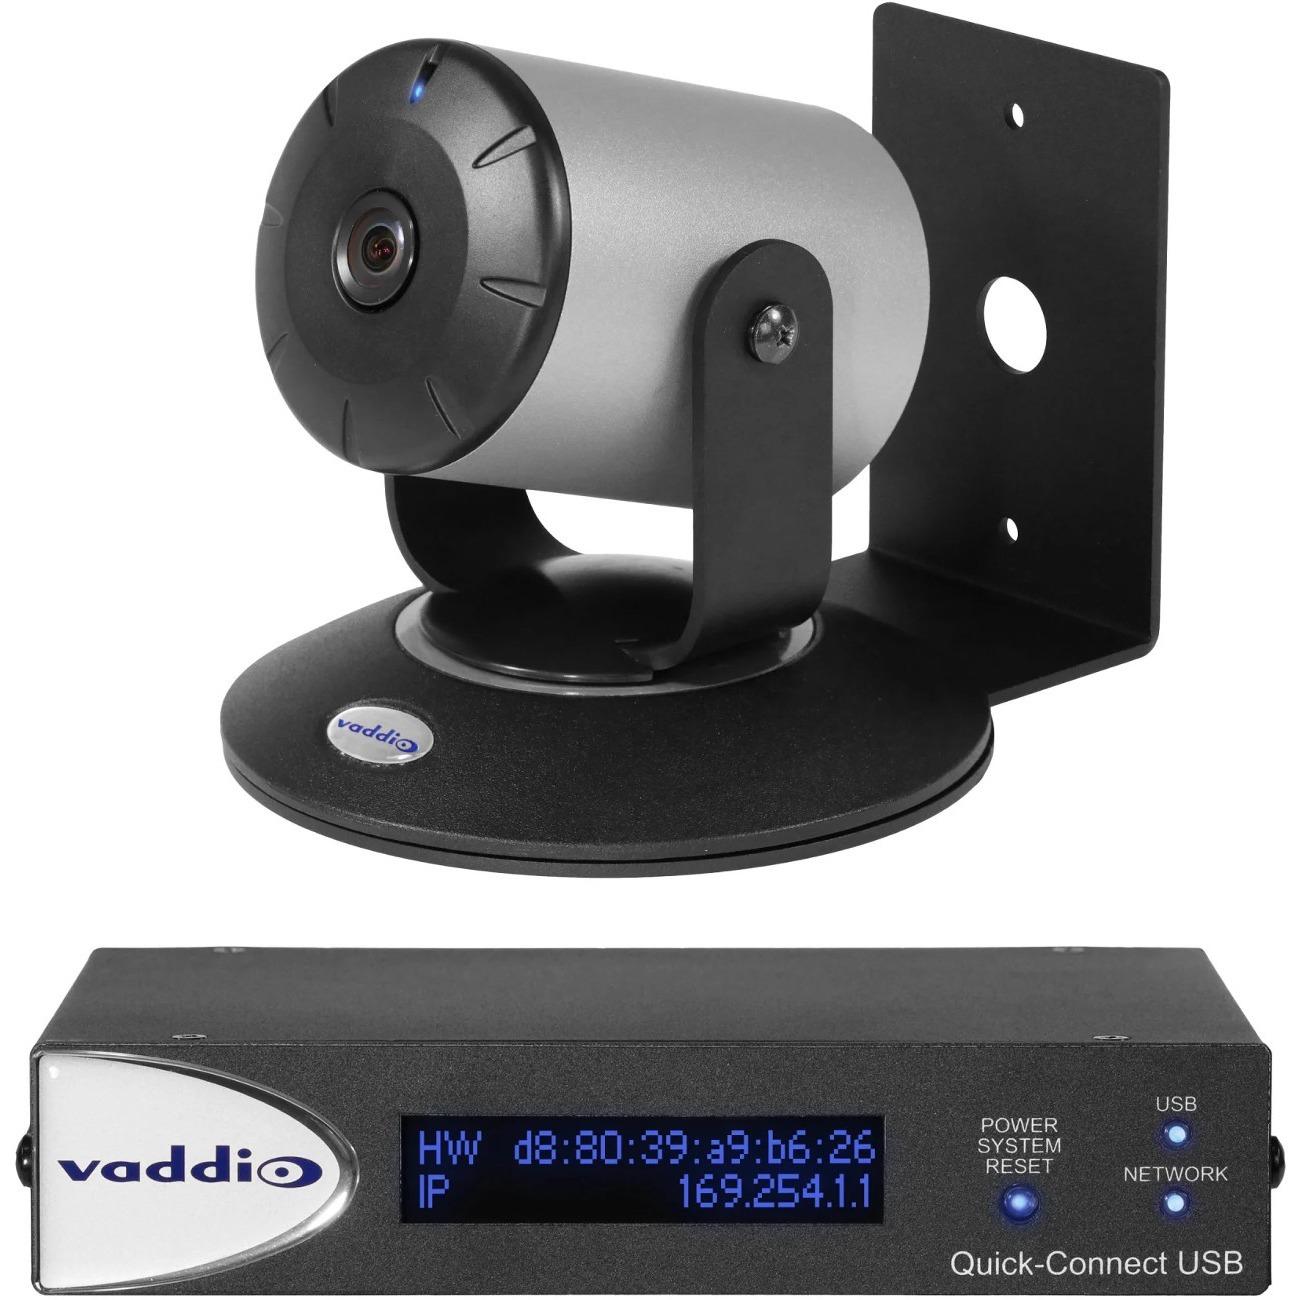 Vaddio WideSHOT Video Conferencing Camera - 2.1 Megapixel - 60 fps - Silver, Black_subImage_1